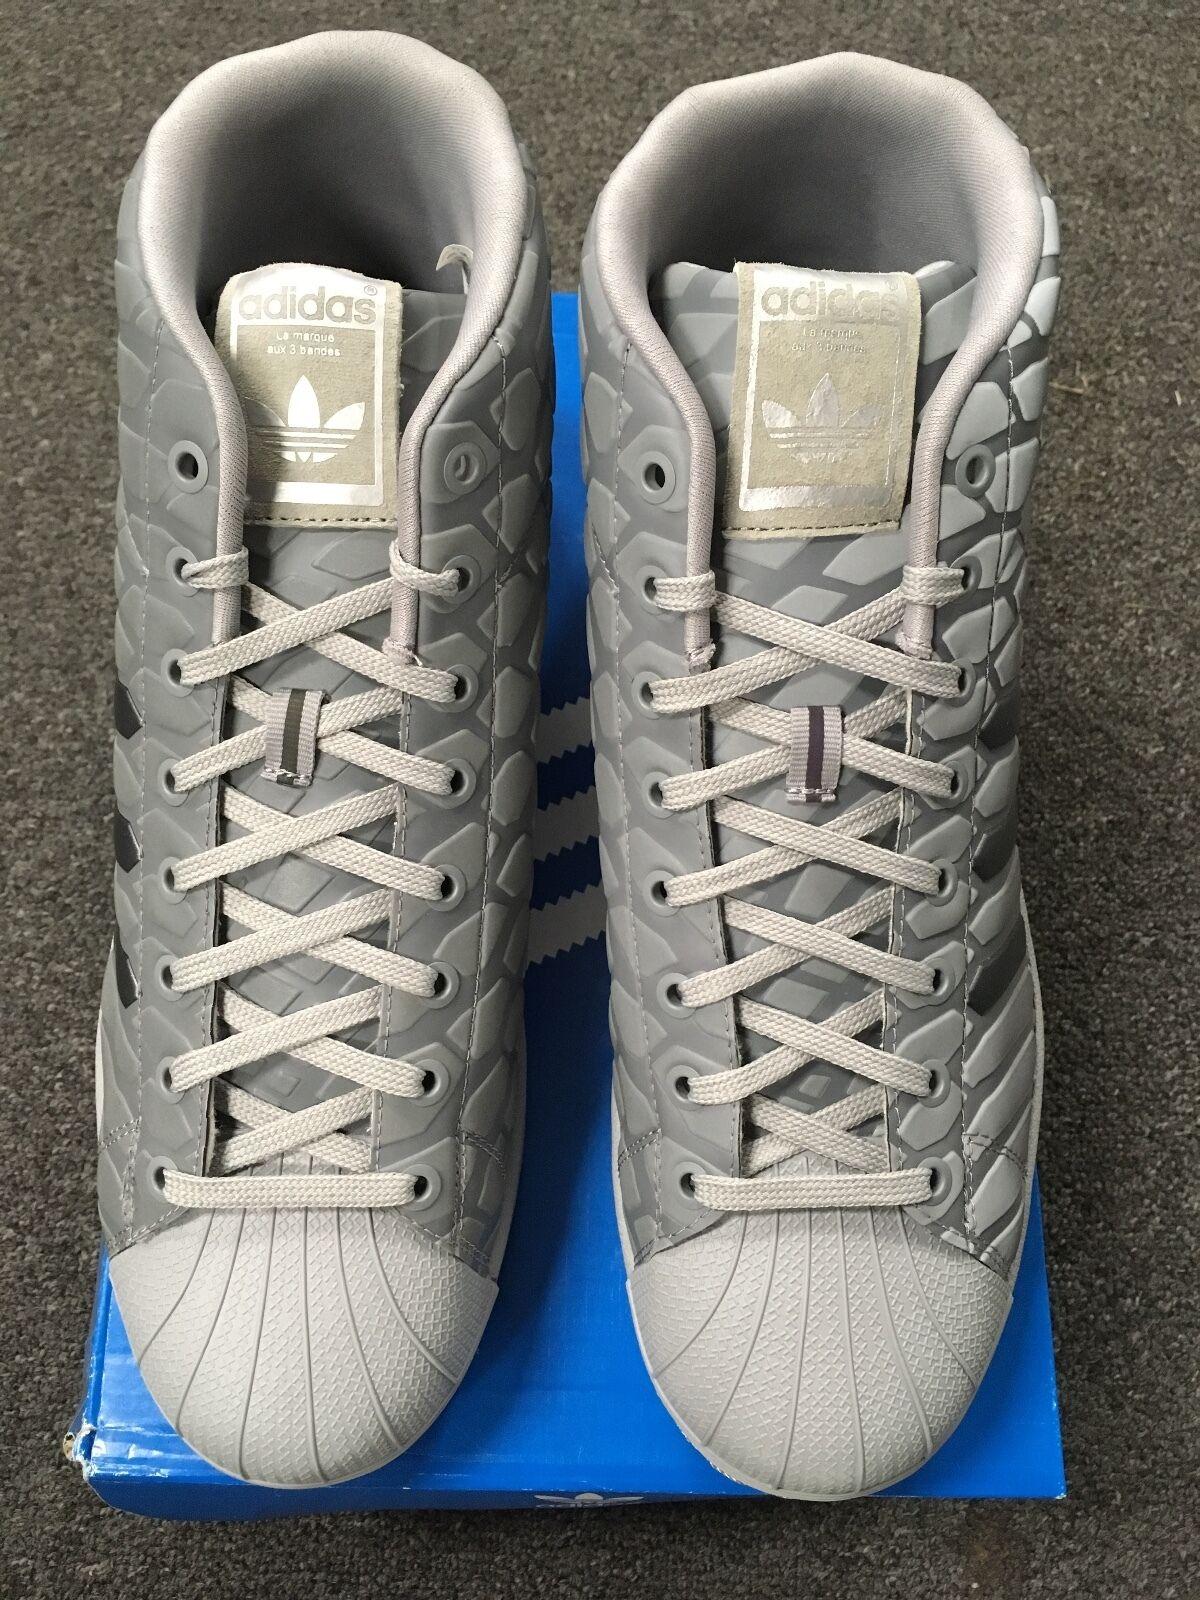 neue adidas pro die model shell die pro turnschuhe (grau) 3c35a2